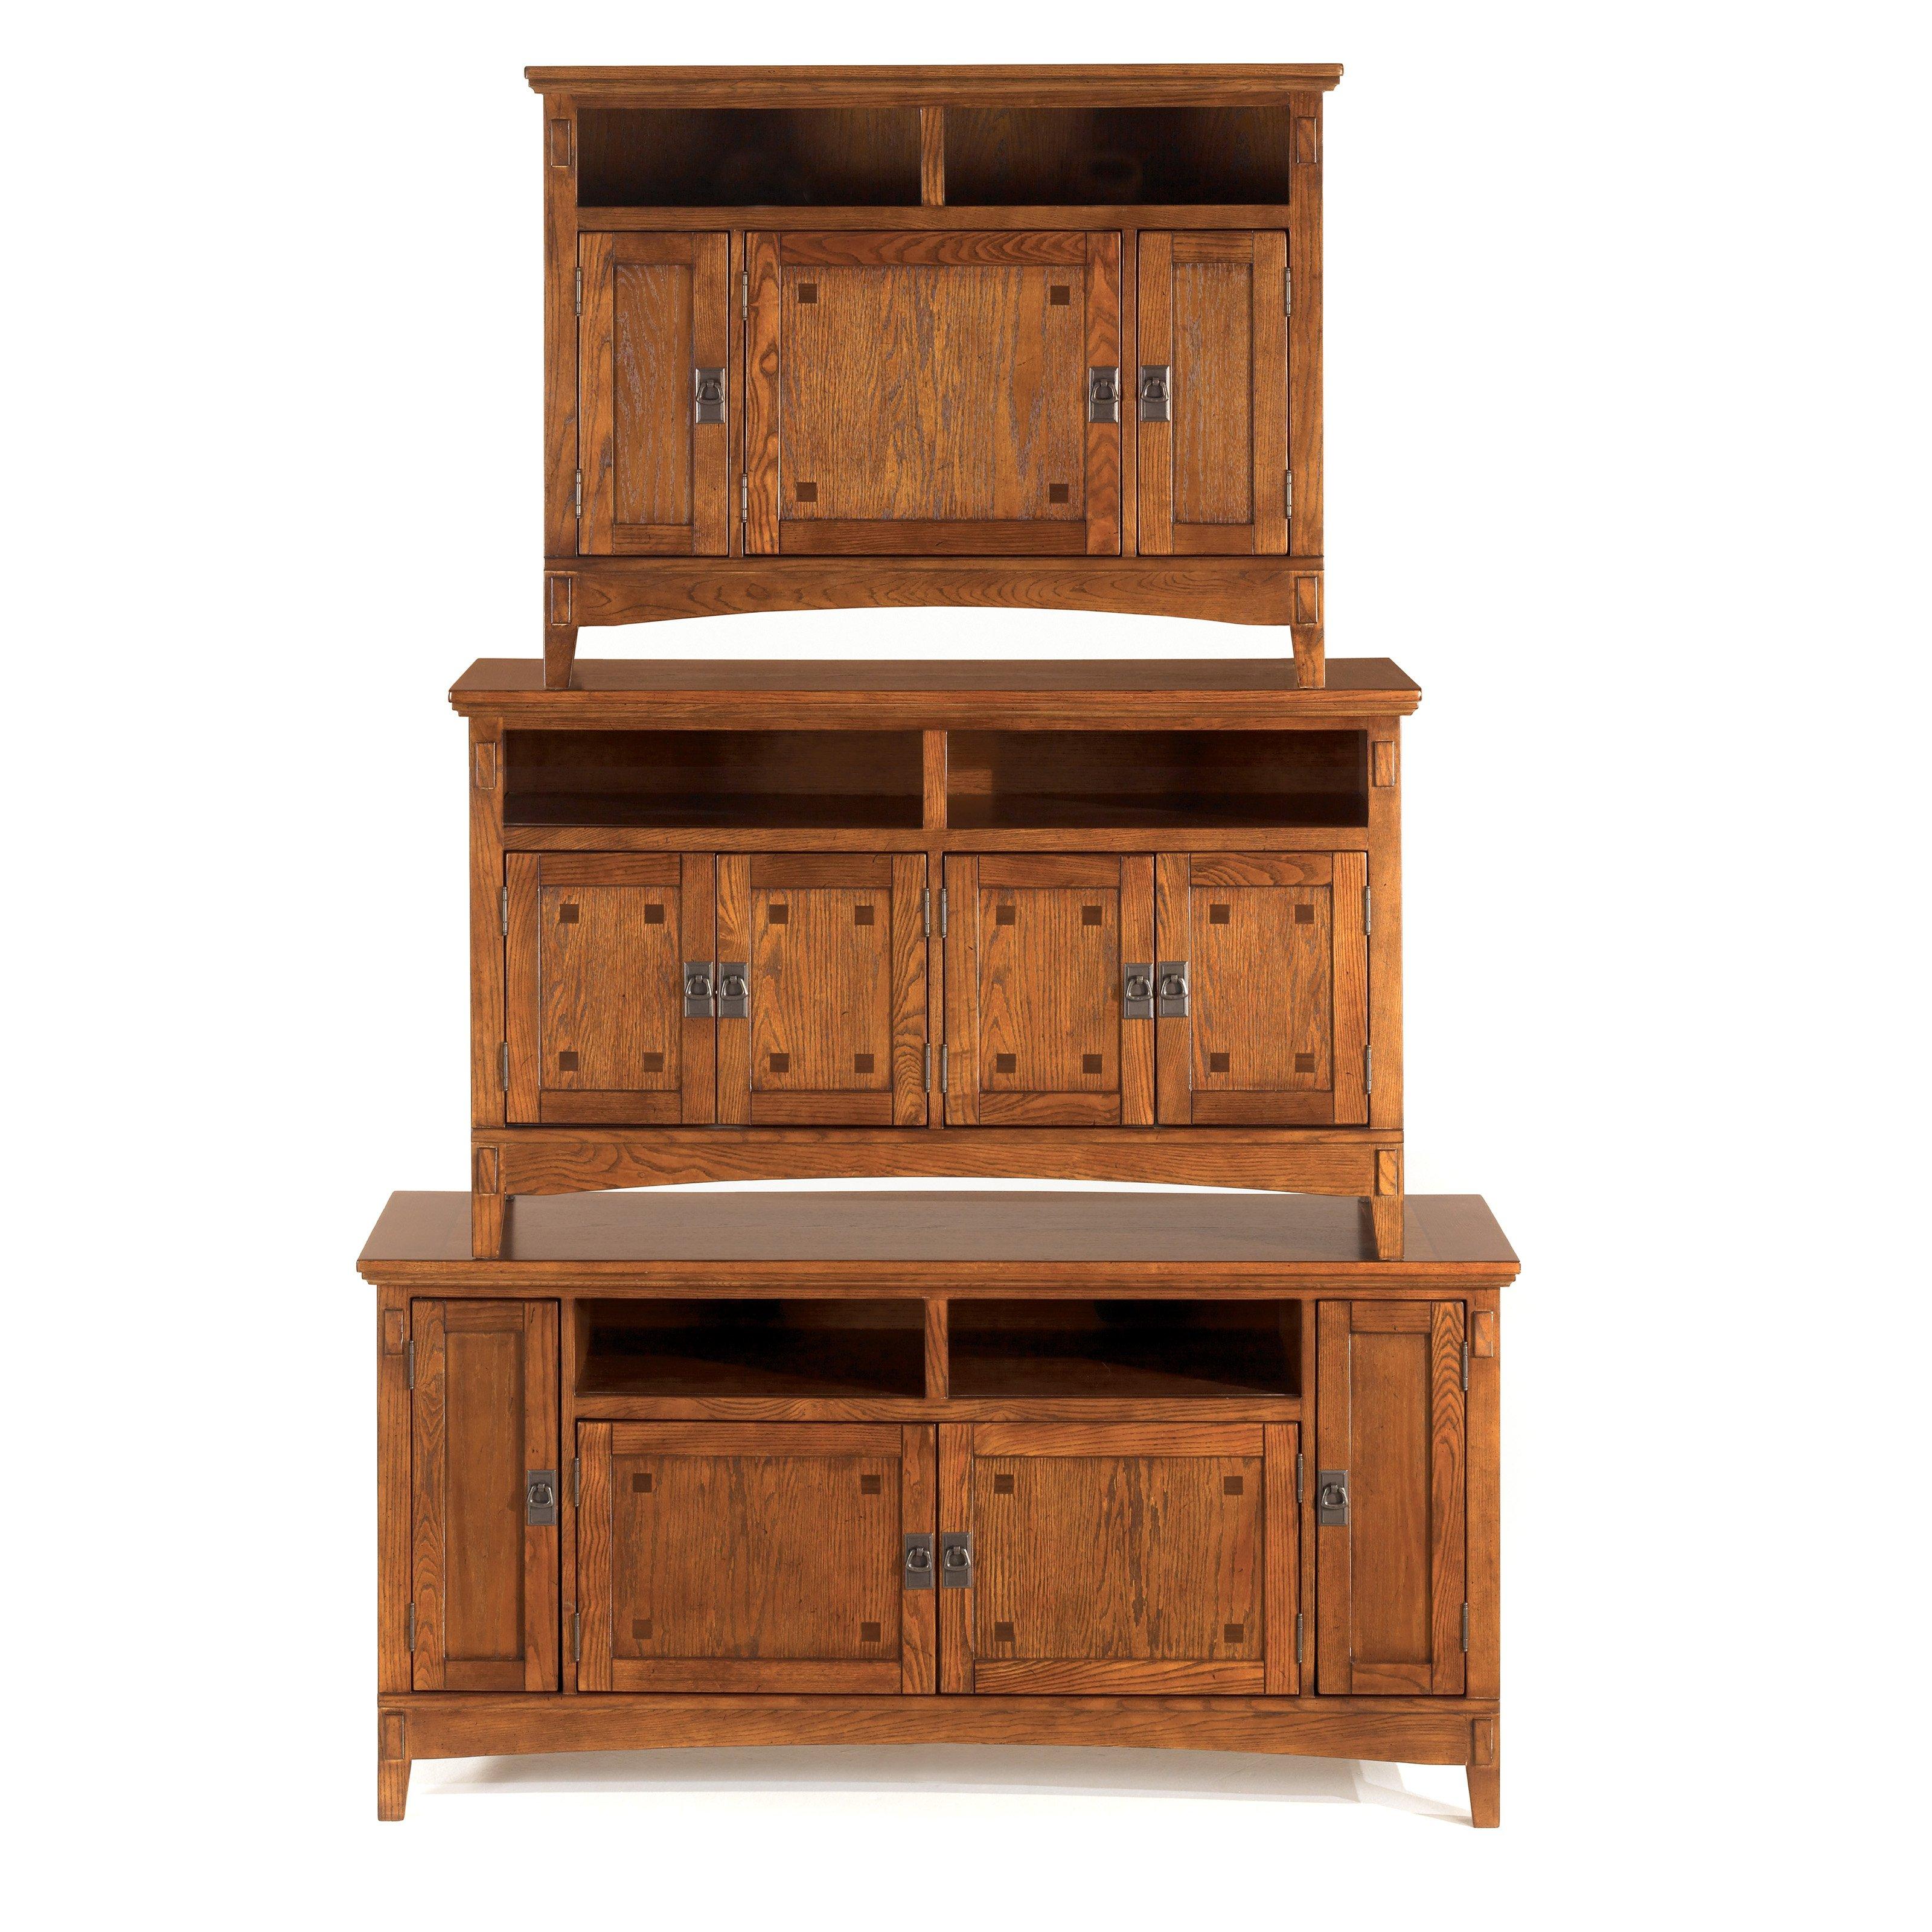 Ashley Furniture Signature Design W319-28 Cross Island 50